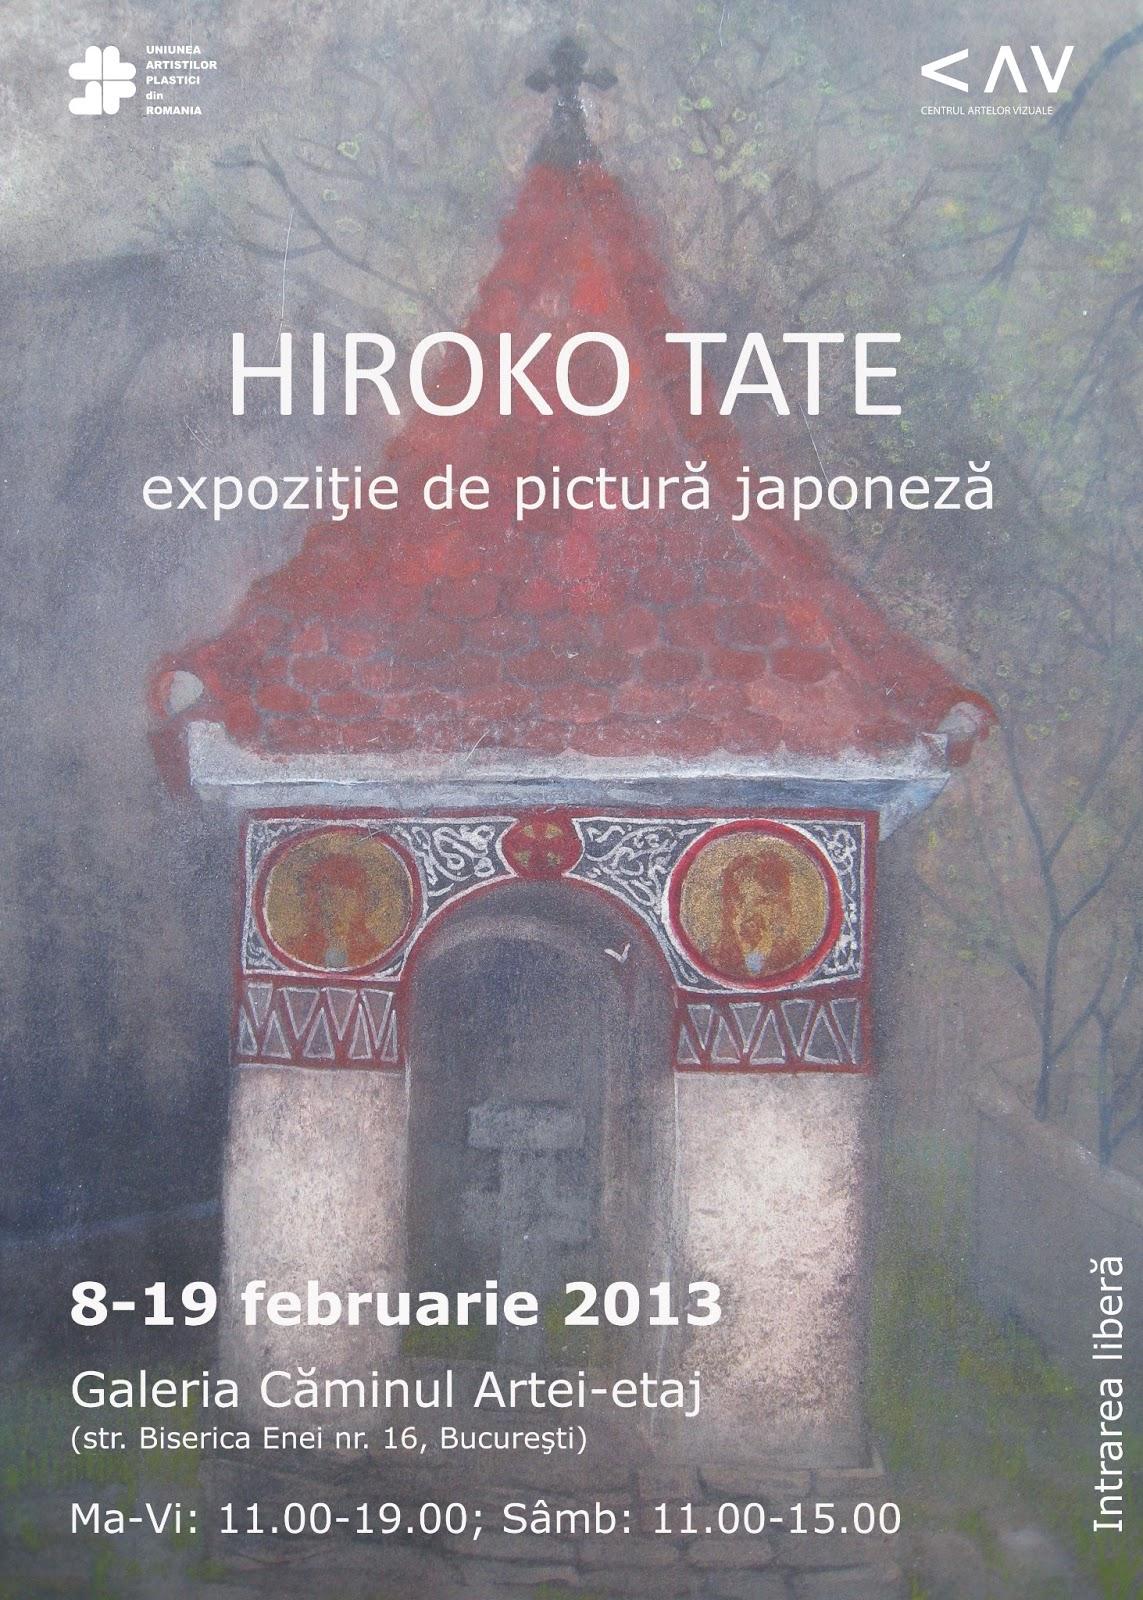 HIROKO TATE